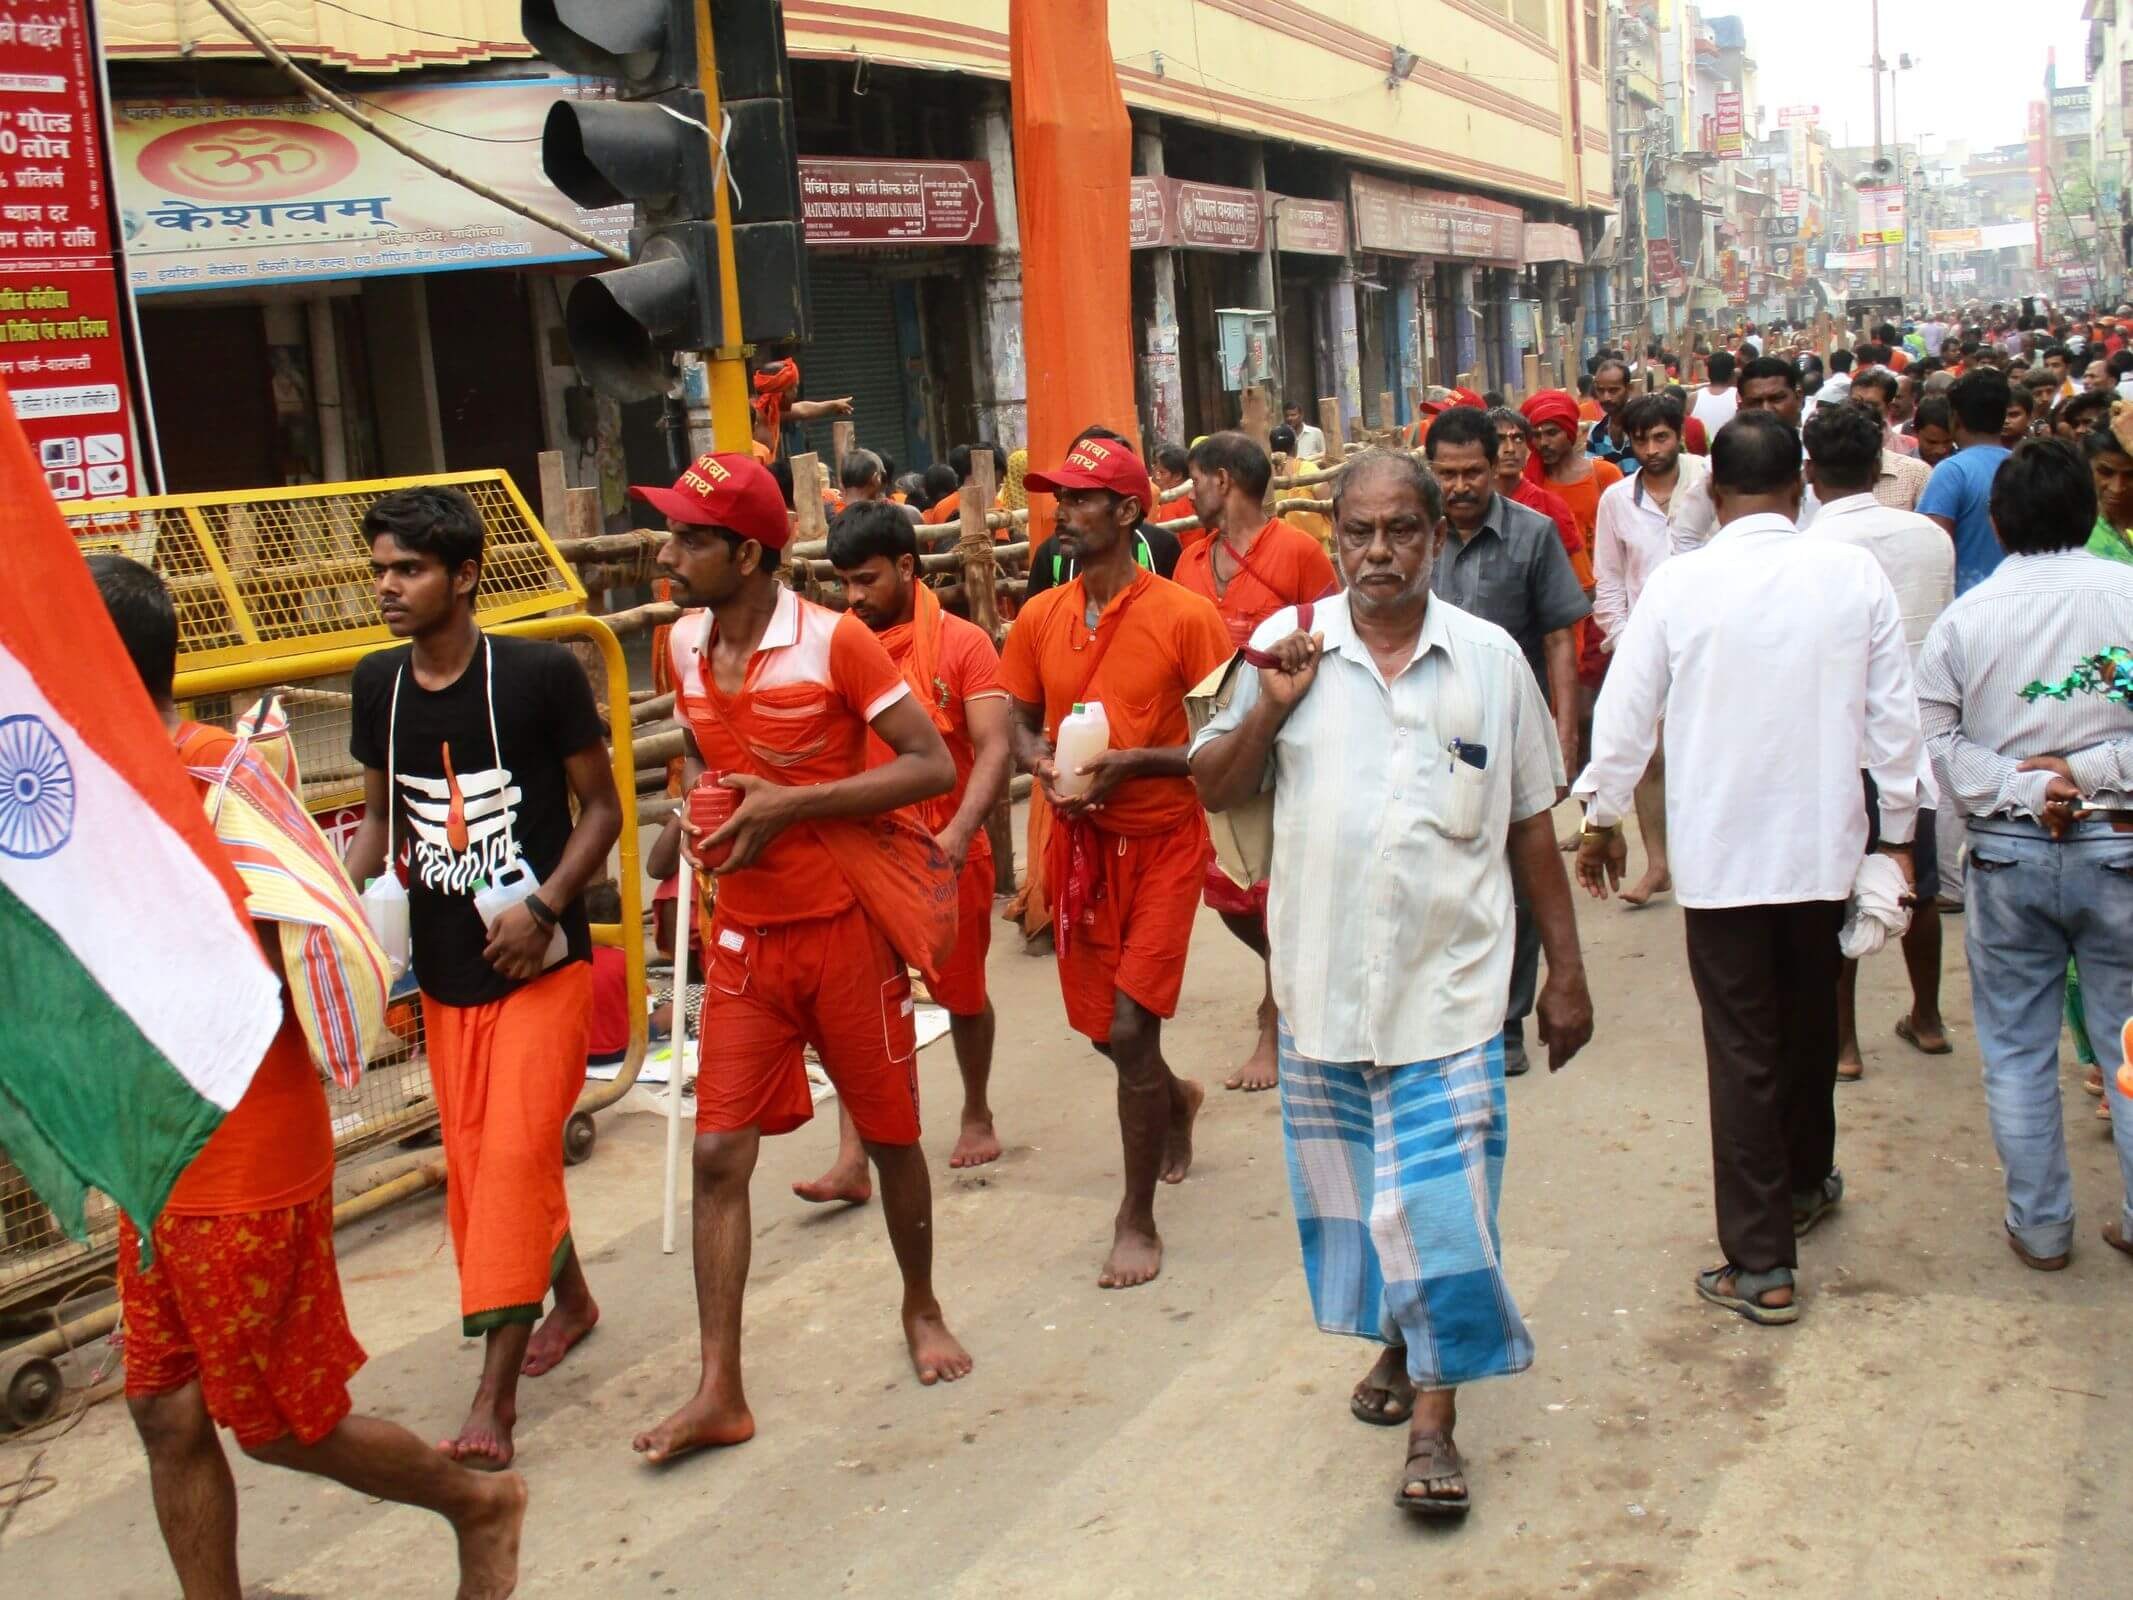 Pilgrims on Yatra